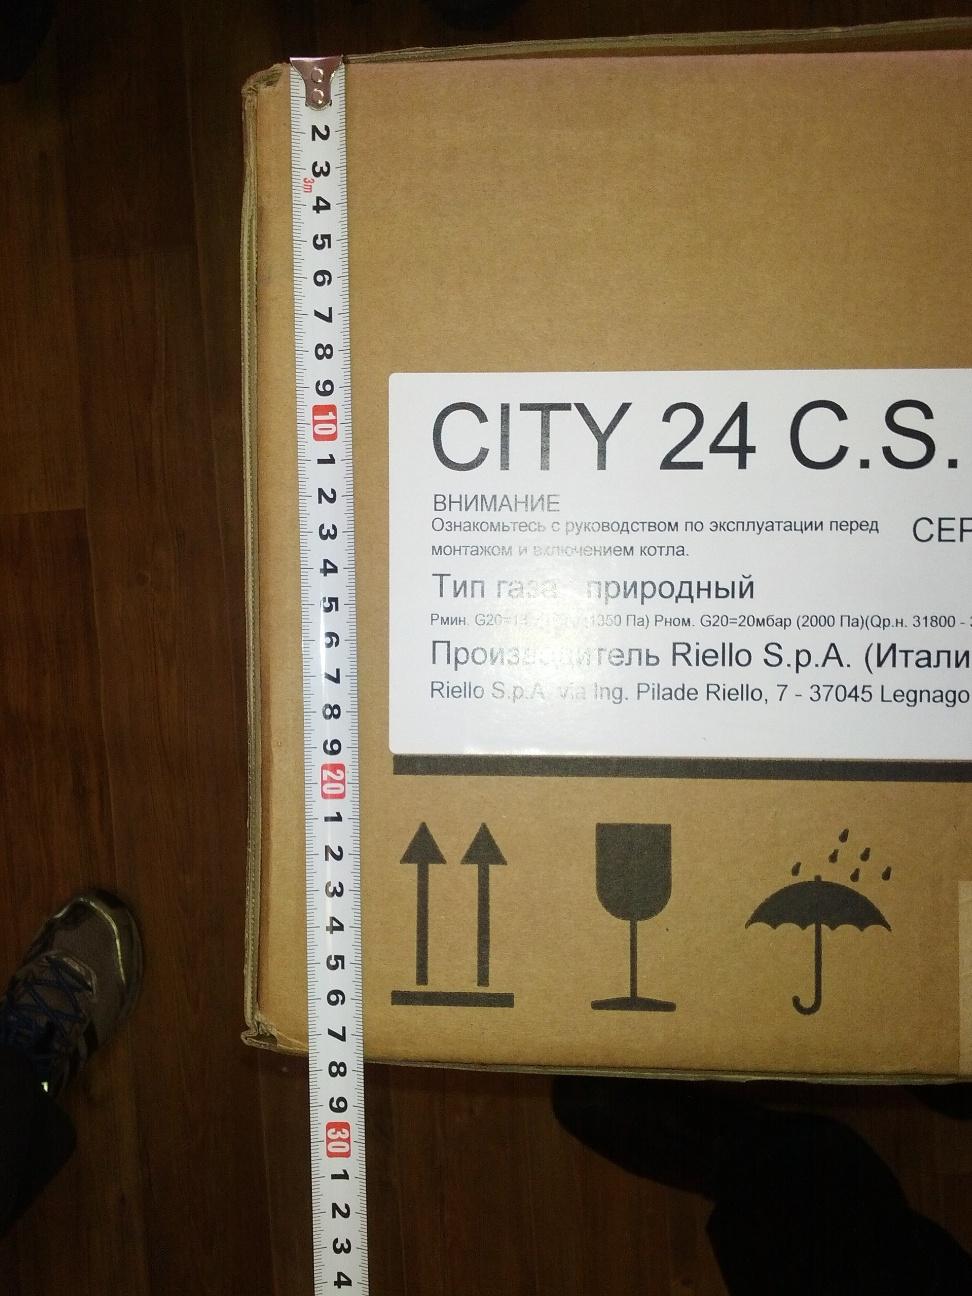 Упаковка Beretta CITY 24 CSI